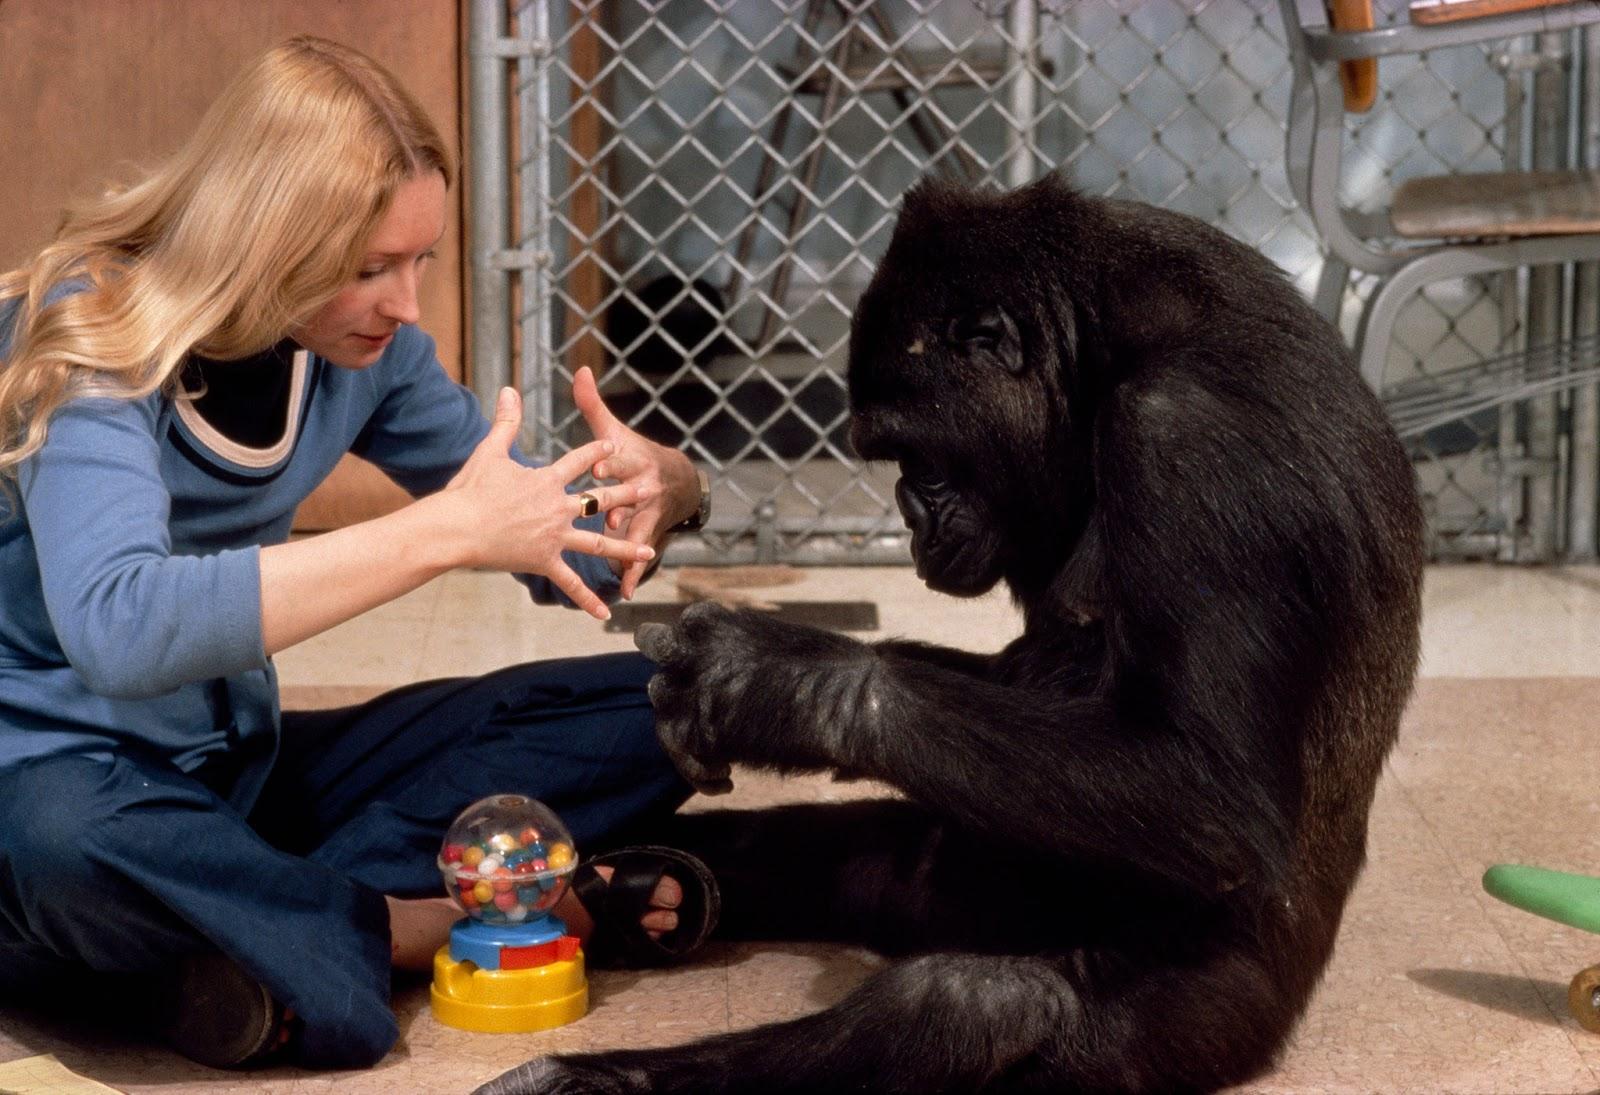 Retro Kimmer S Blog Koko The Sign Language Gorilla Has Died At 46